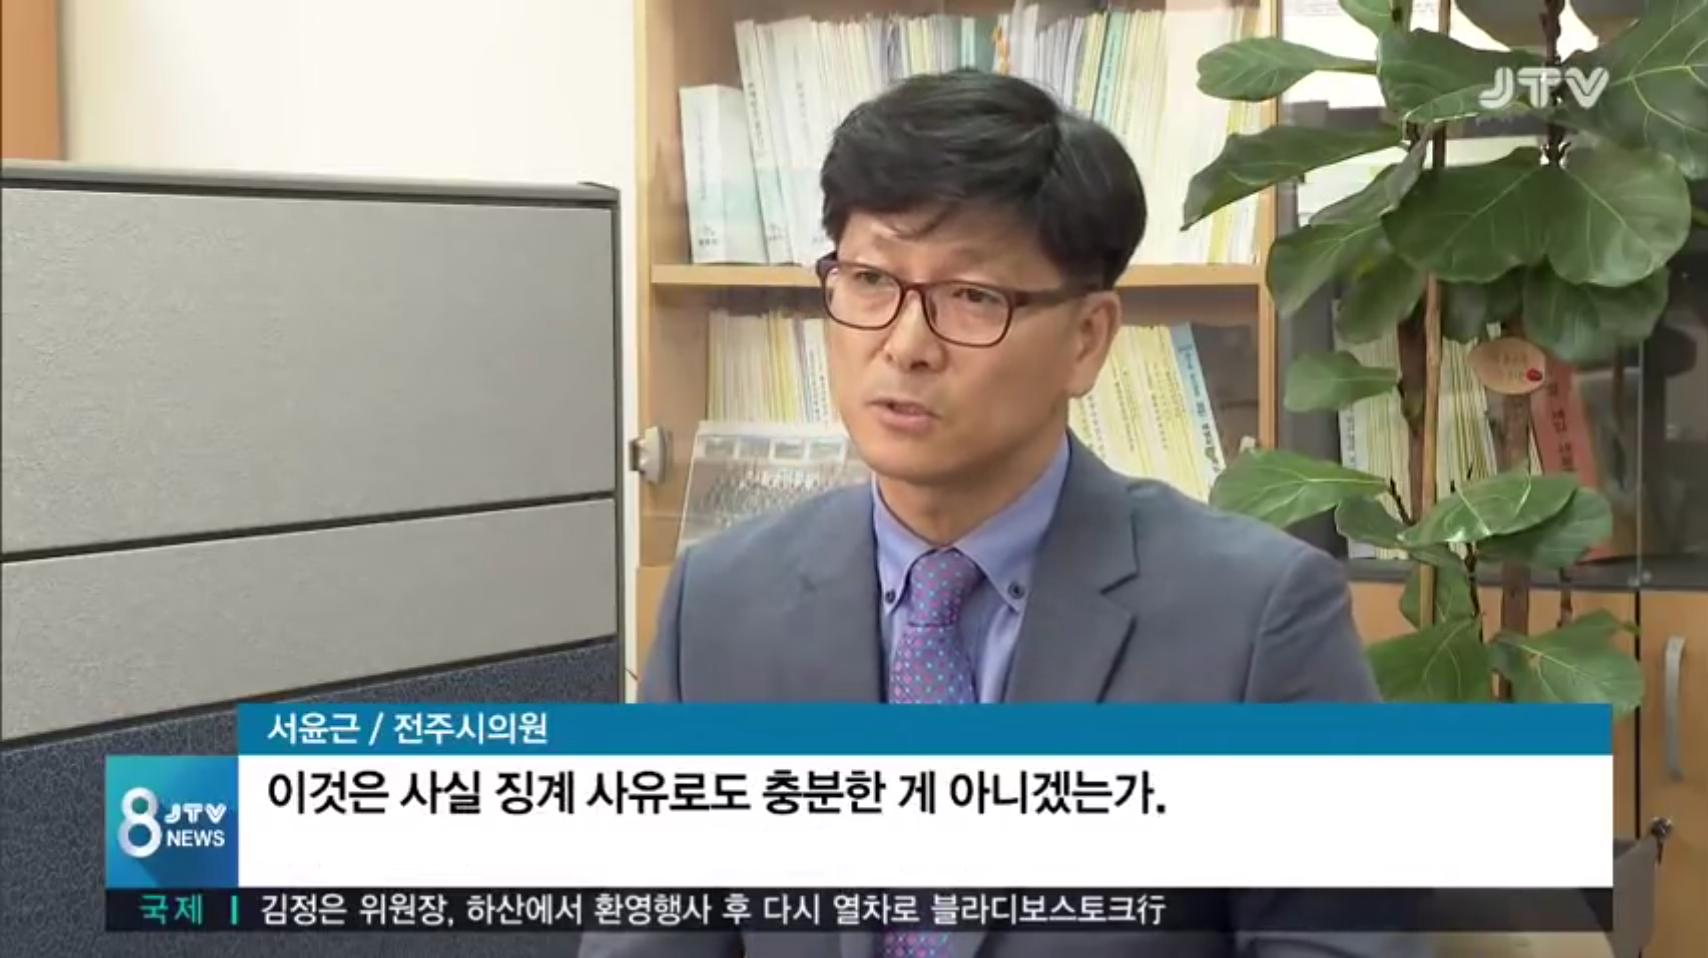 [19.4.24 JTV] 전주시, 아파트재개발 승인 허술, 정보공개 거부로 시민만 골탕10.png